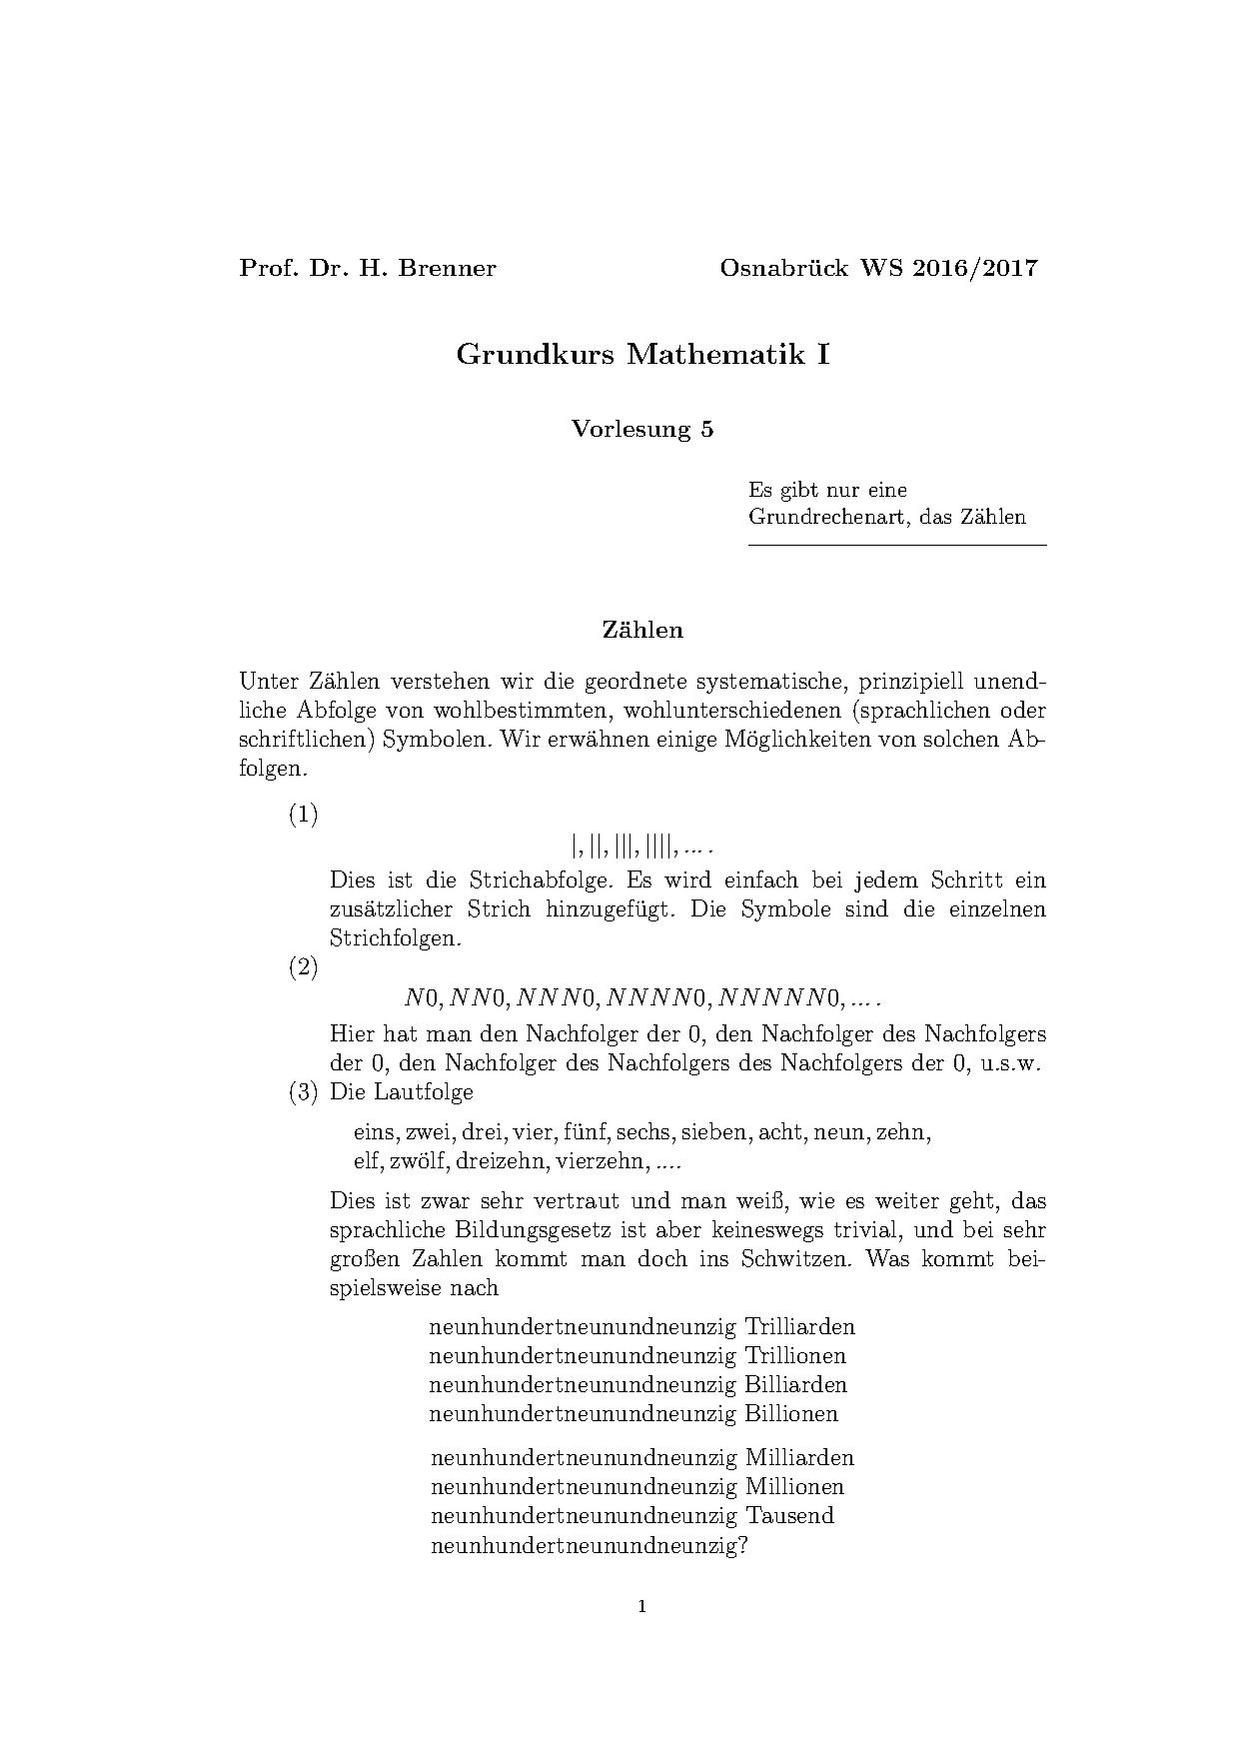 File:Grundkurs Mathematik (Osnabrück 2016-2017)Teil IVorlesung5.pdf ...